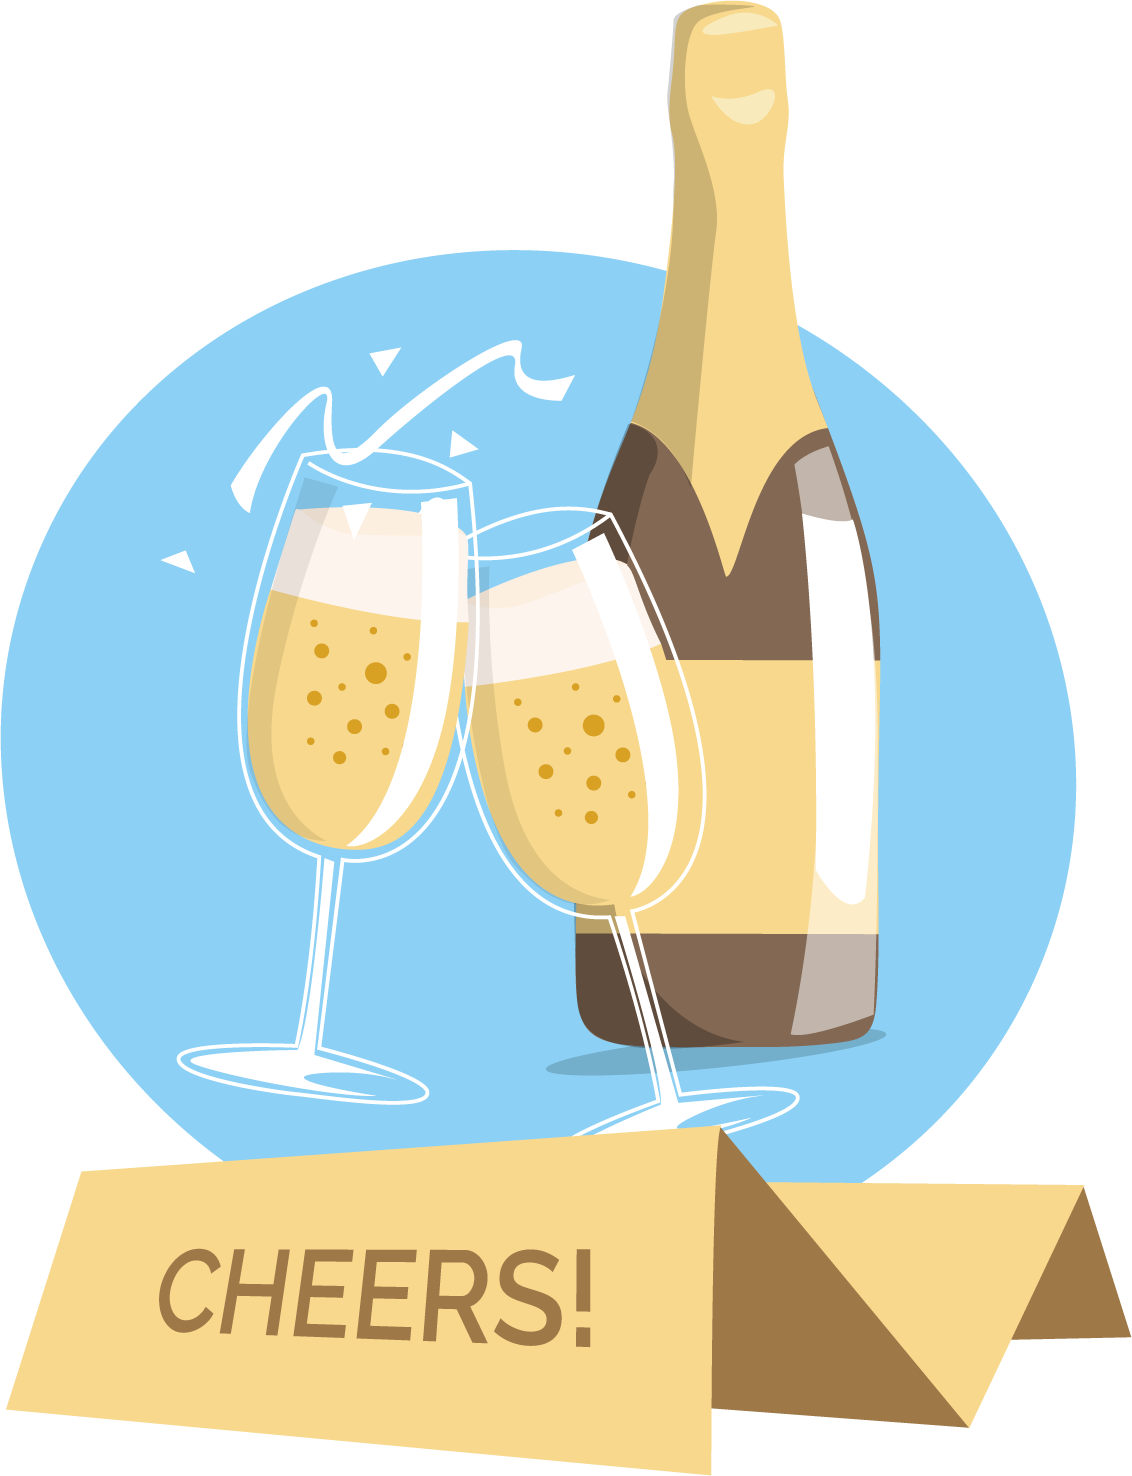 Drinks clipart vector. Toast food wine frames